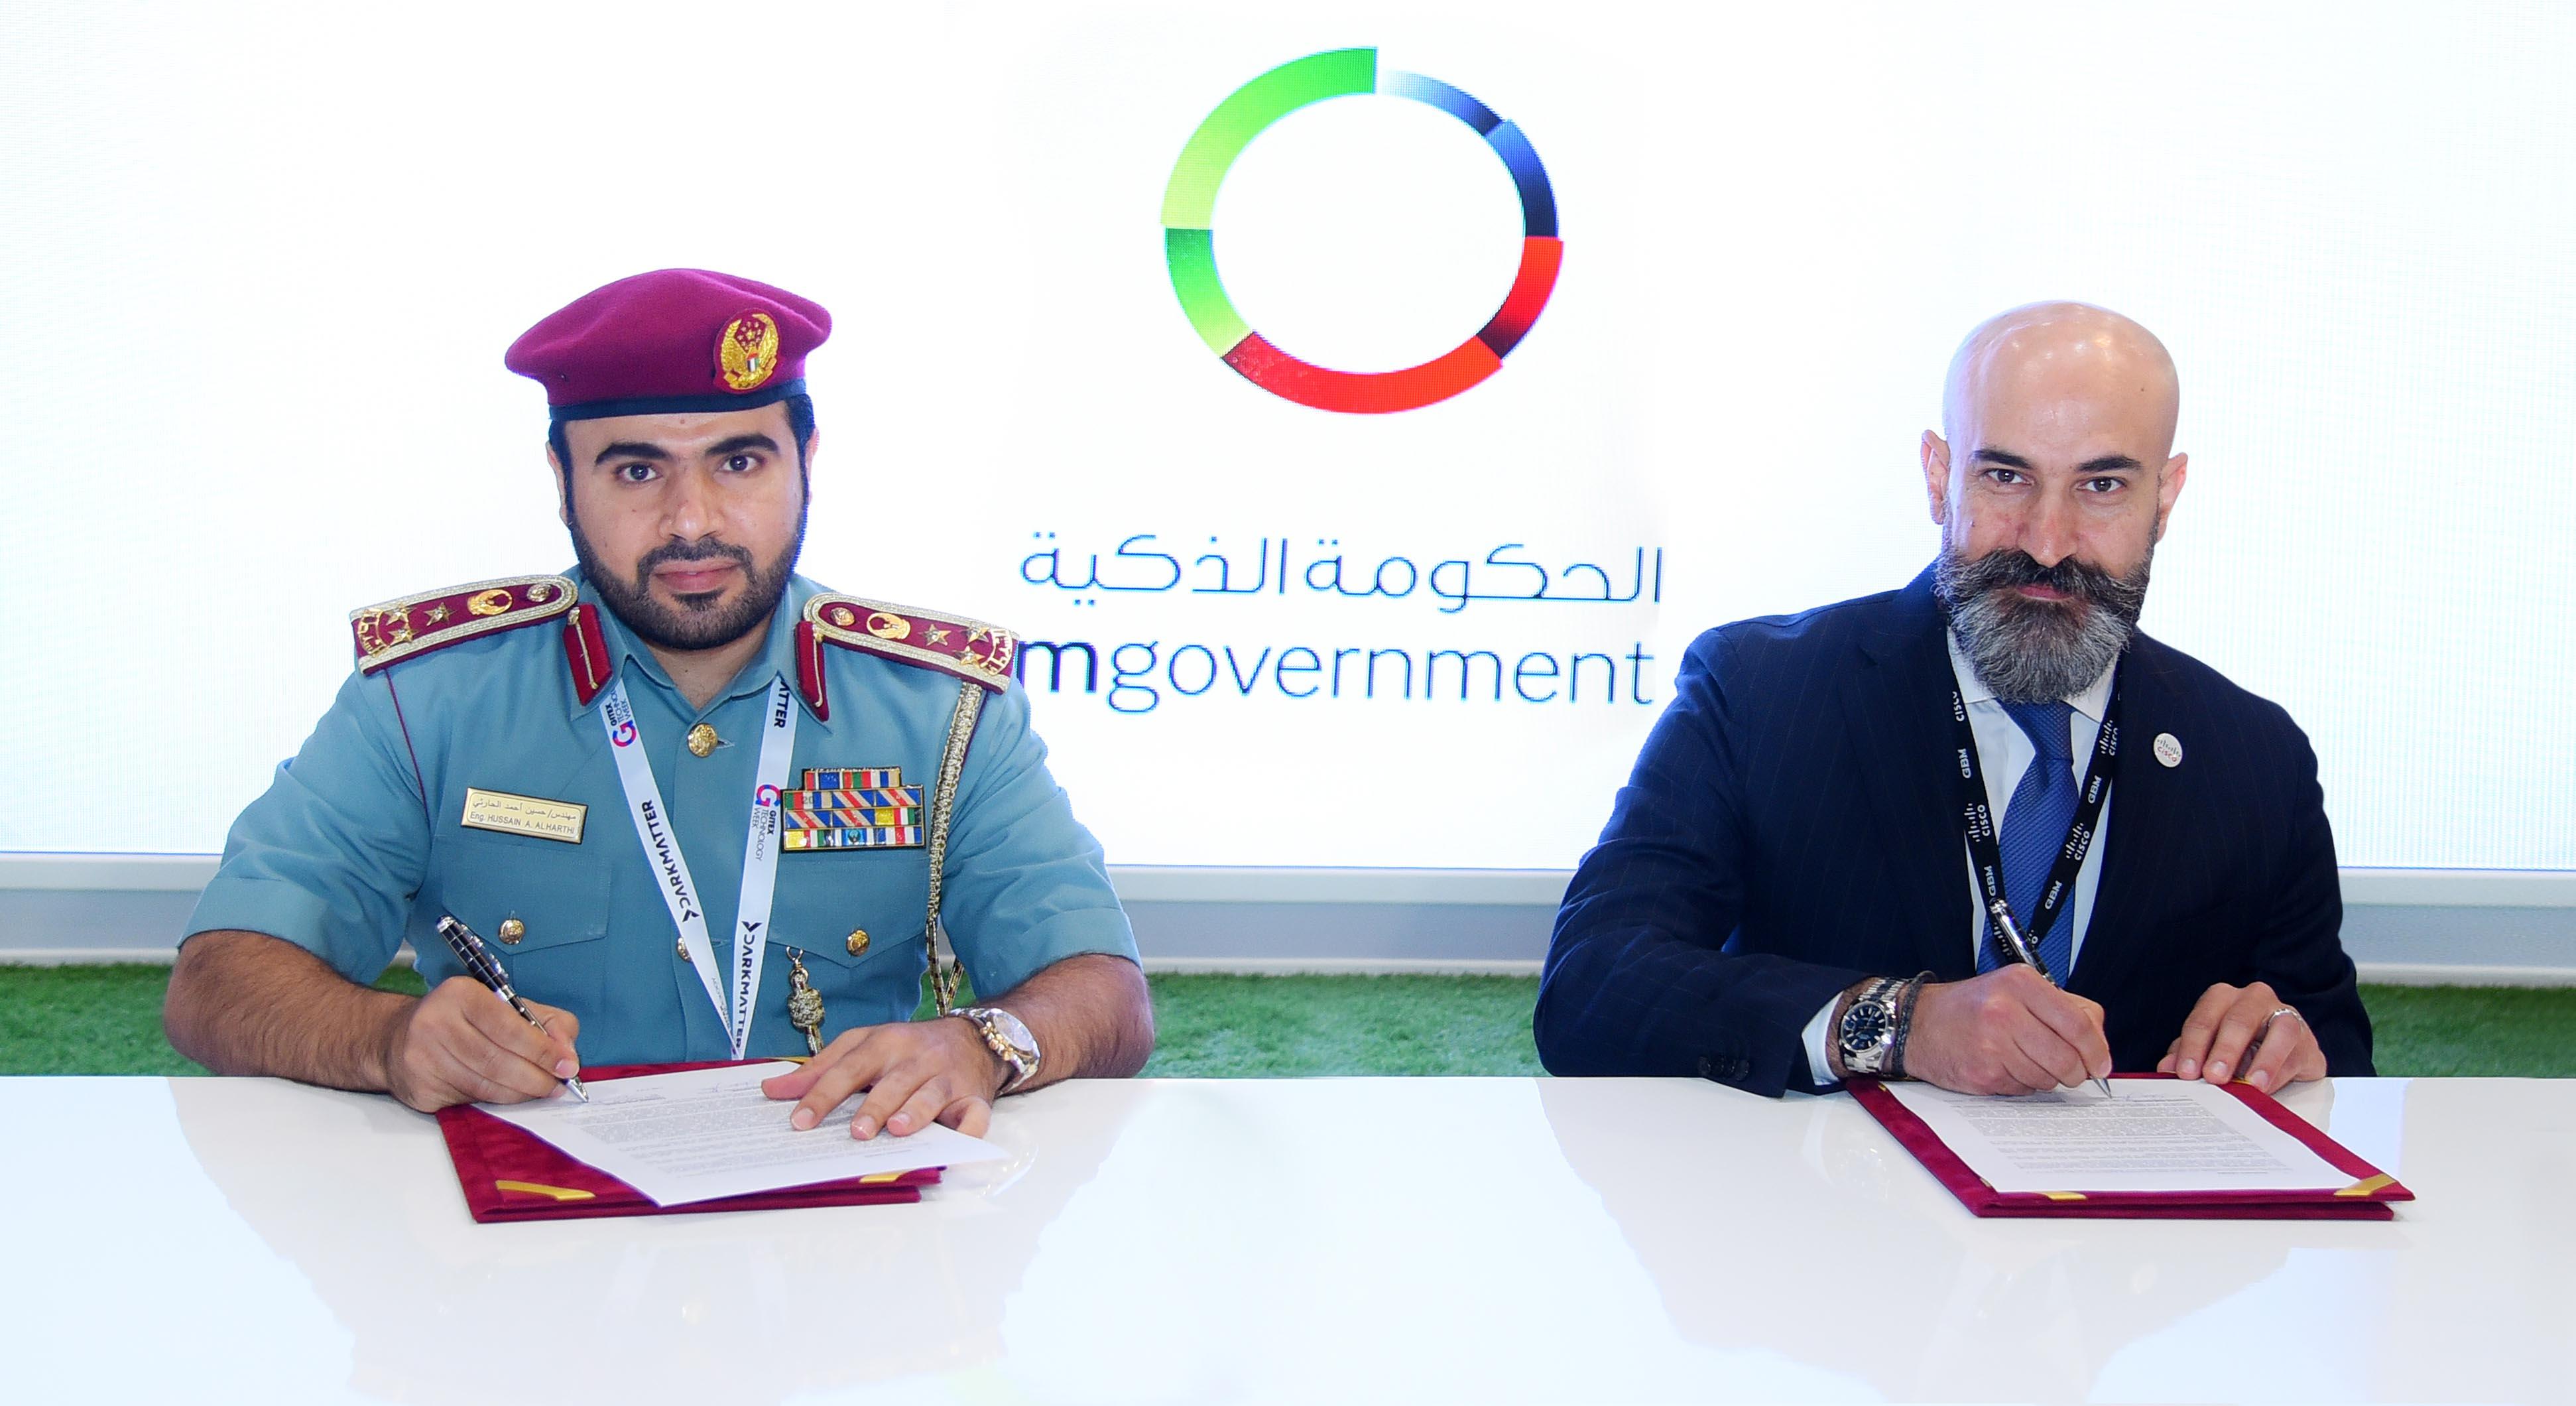 UAE MoI progresses in deploying Cisco collaboration solution